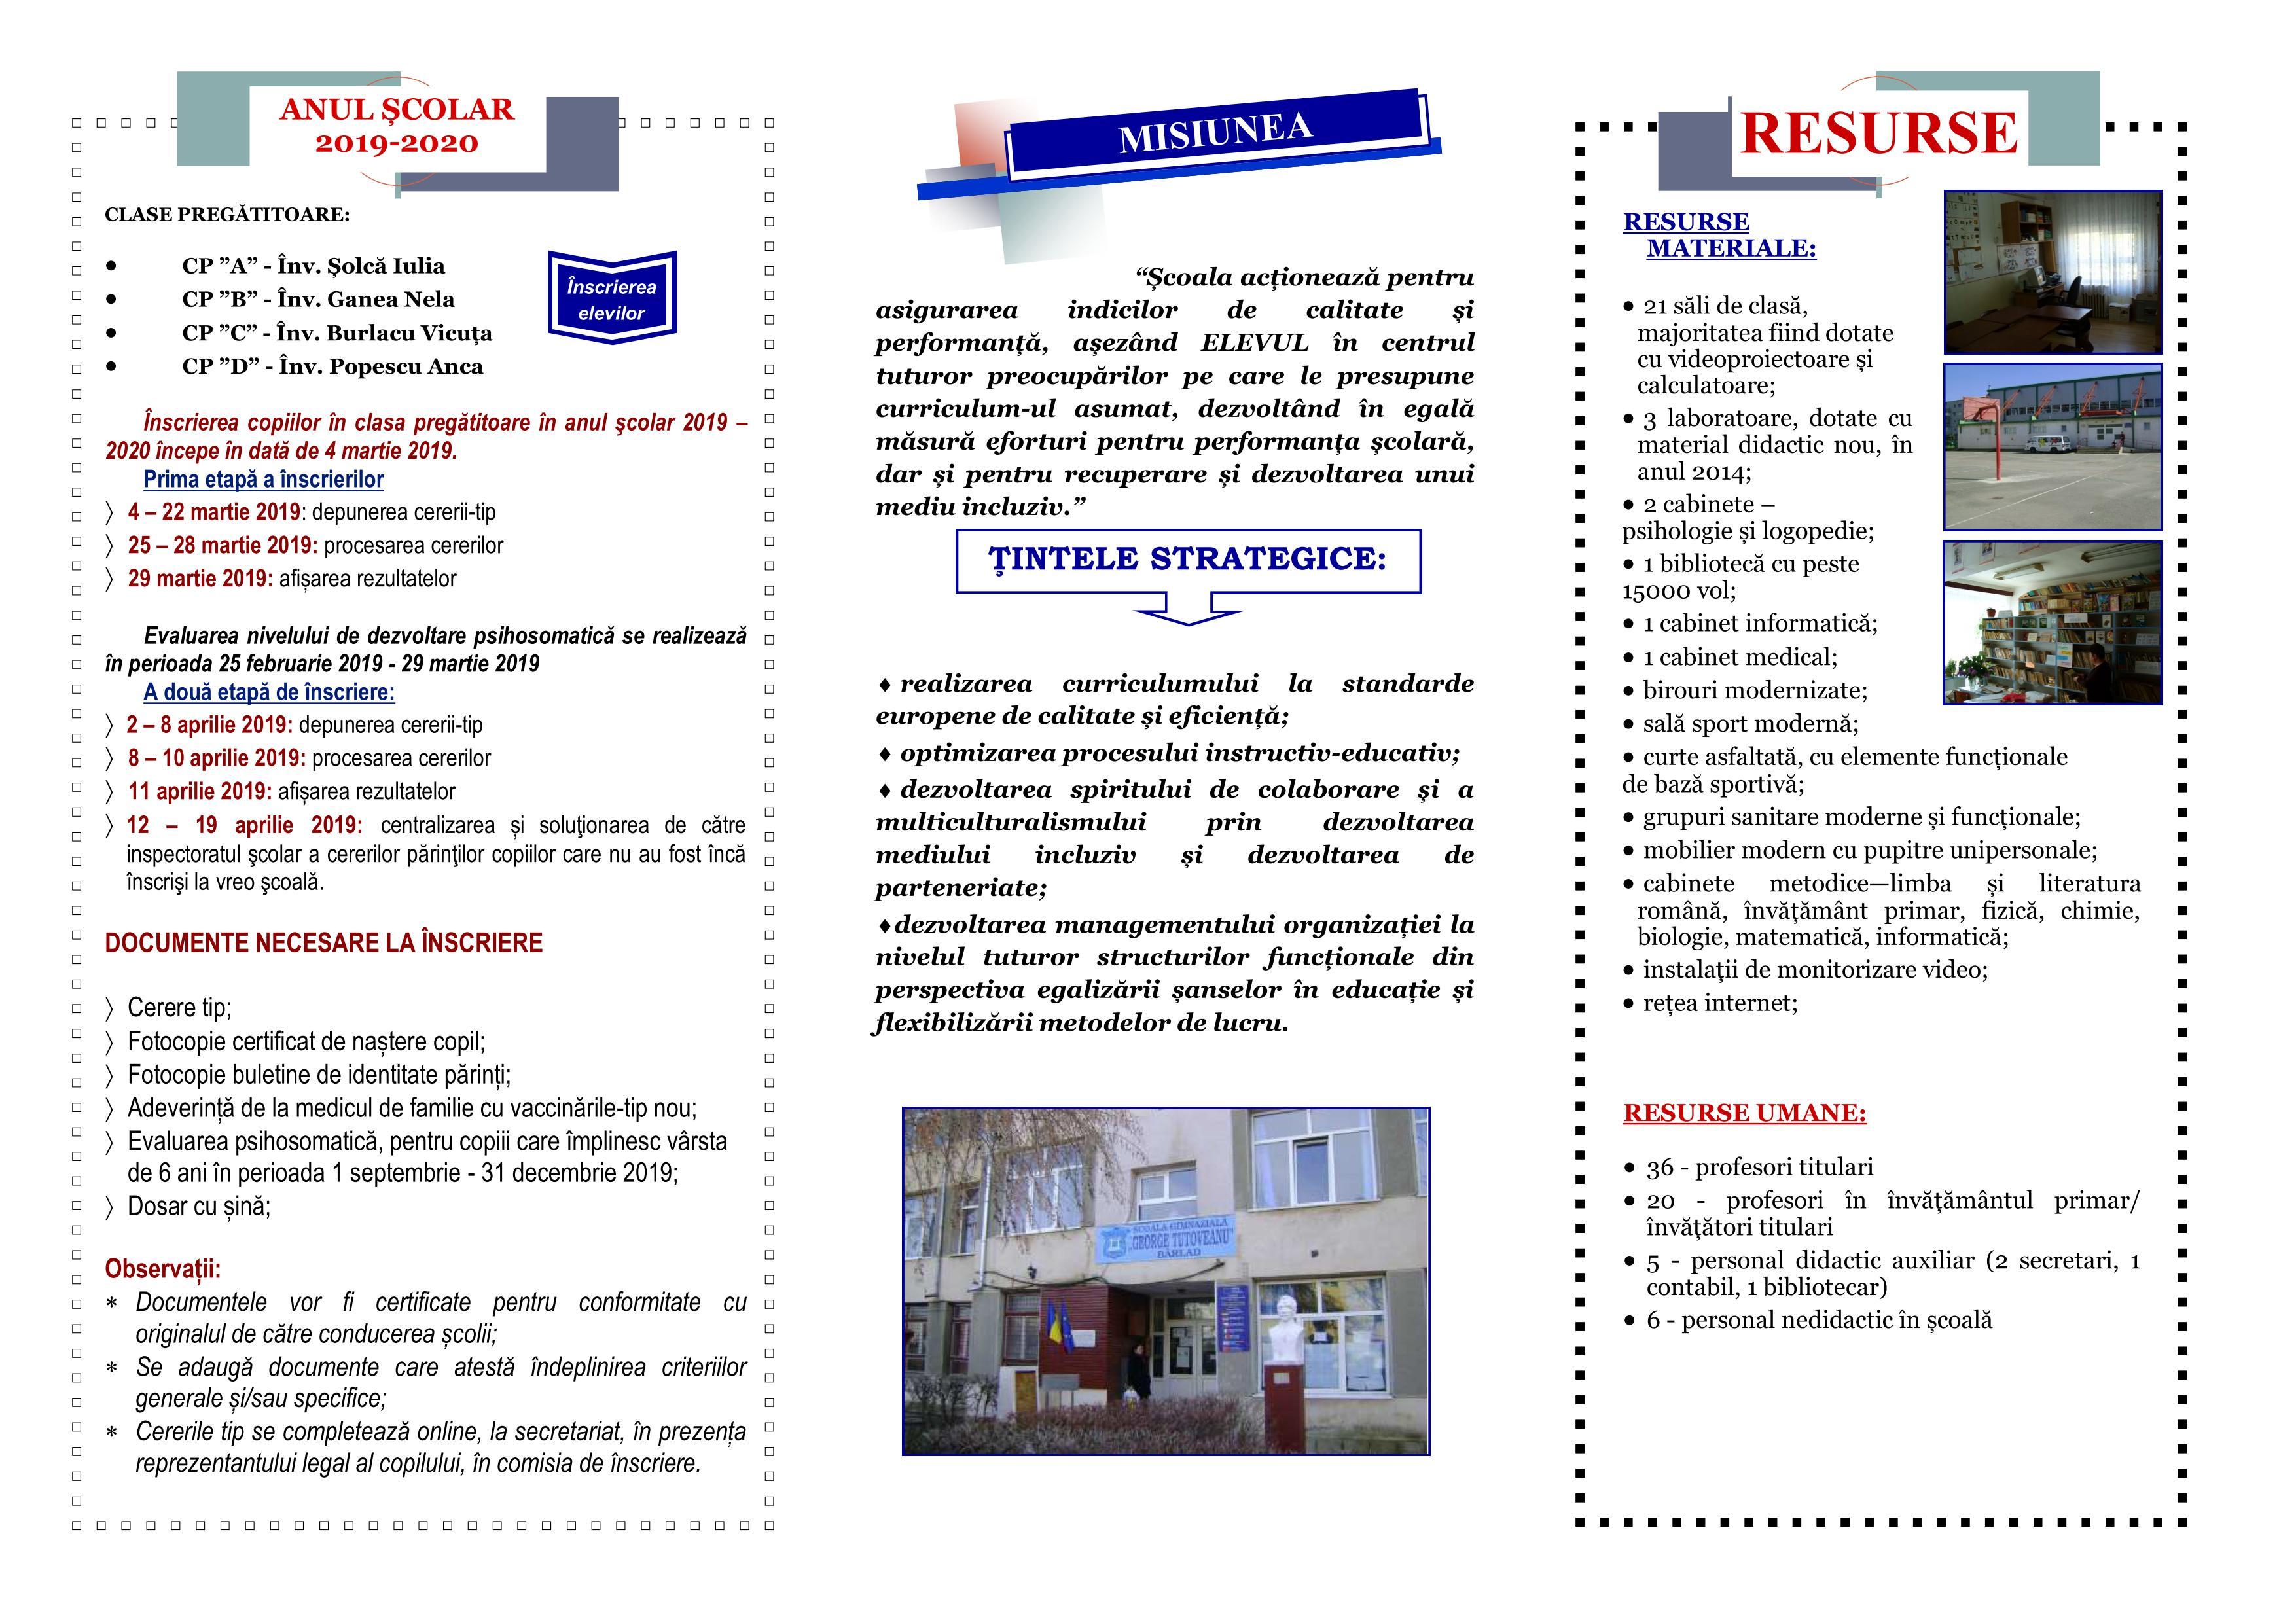 Imagini ştiri: certificat2_01.jpg